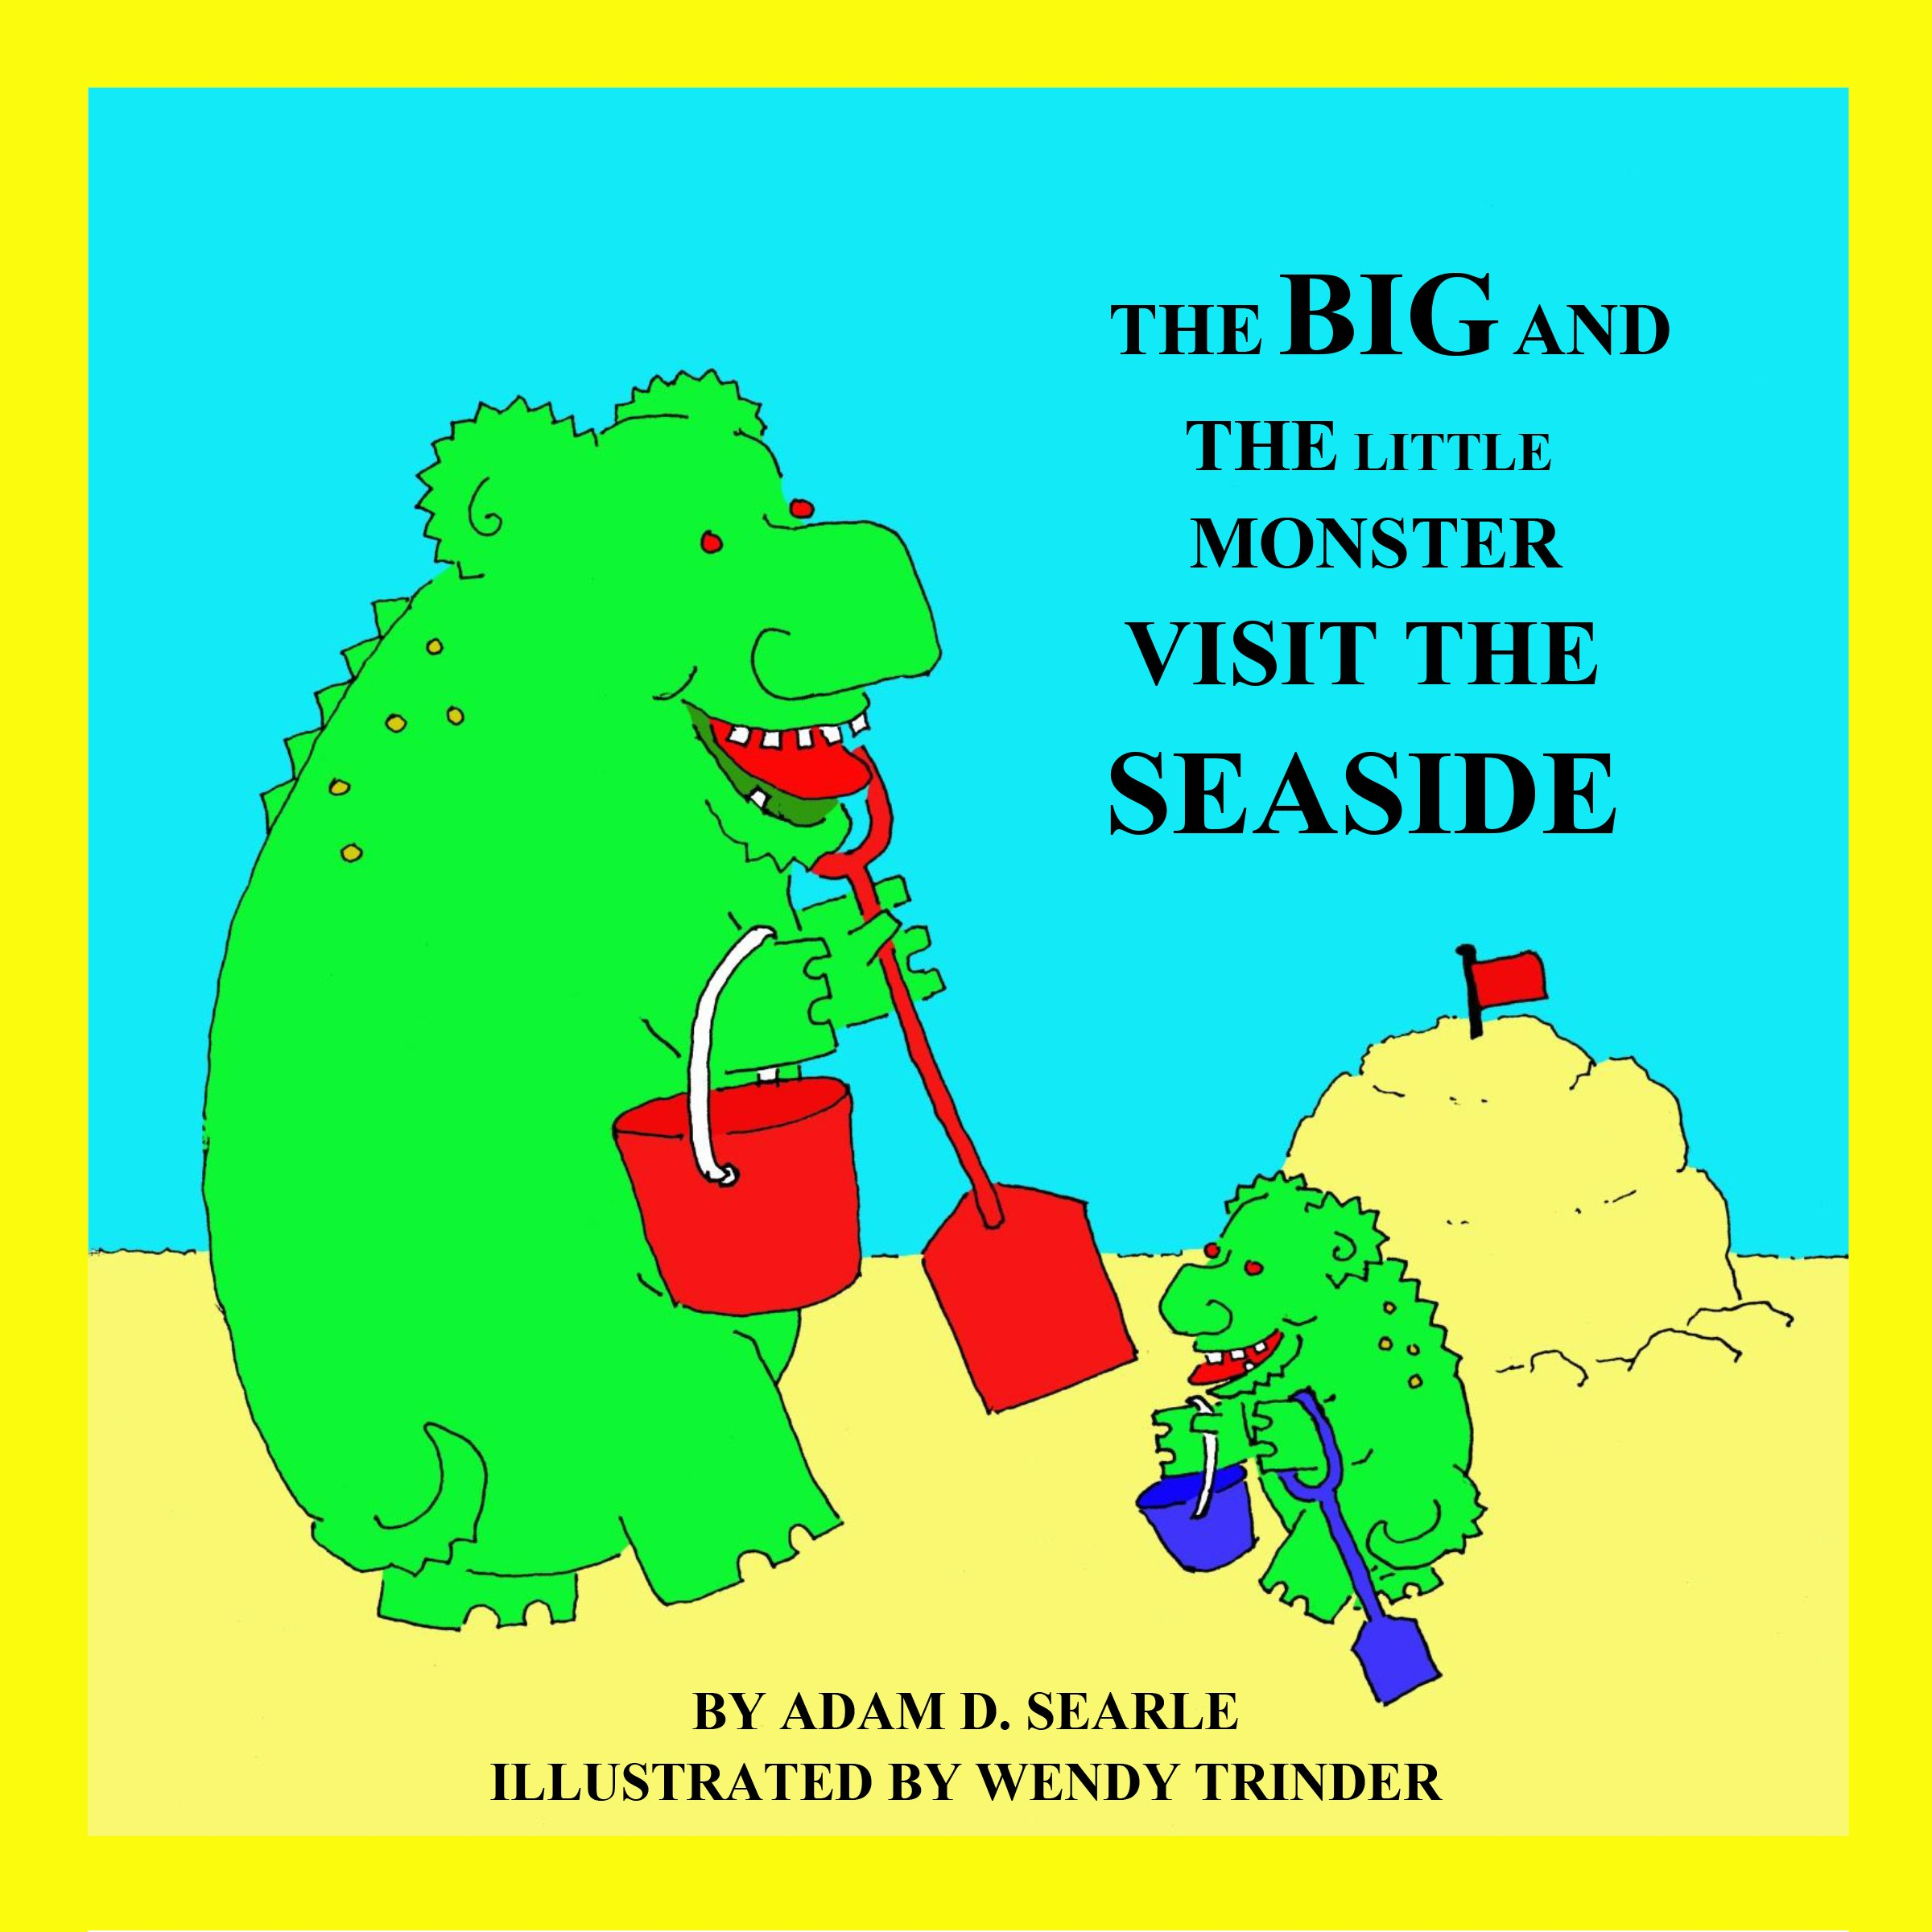 visit the seaside